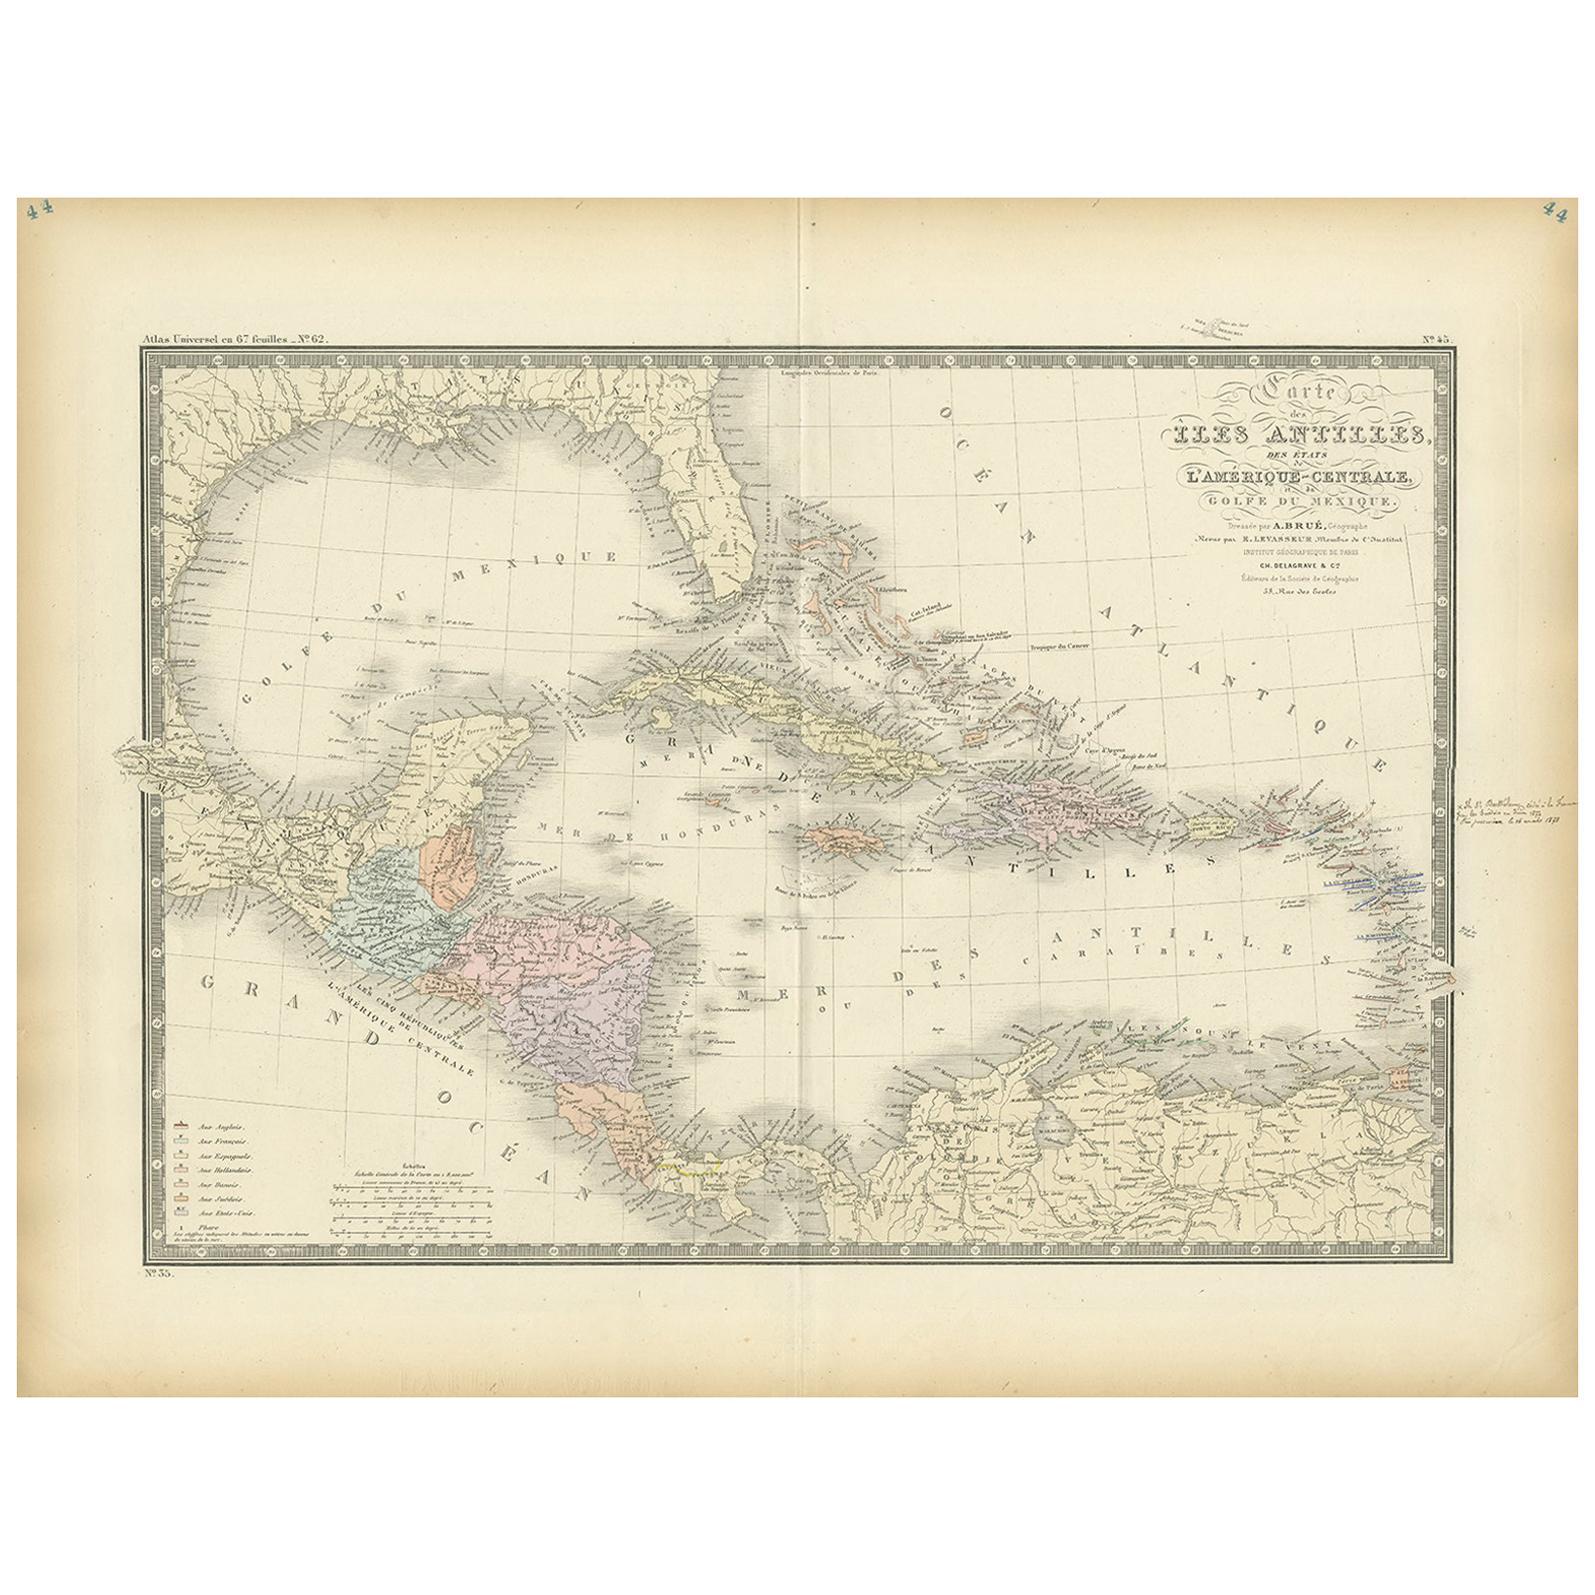 Antique Map of the Antilles by Levasseur, '1875'